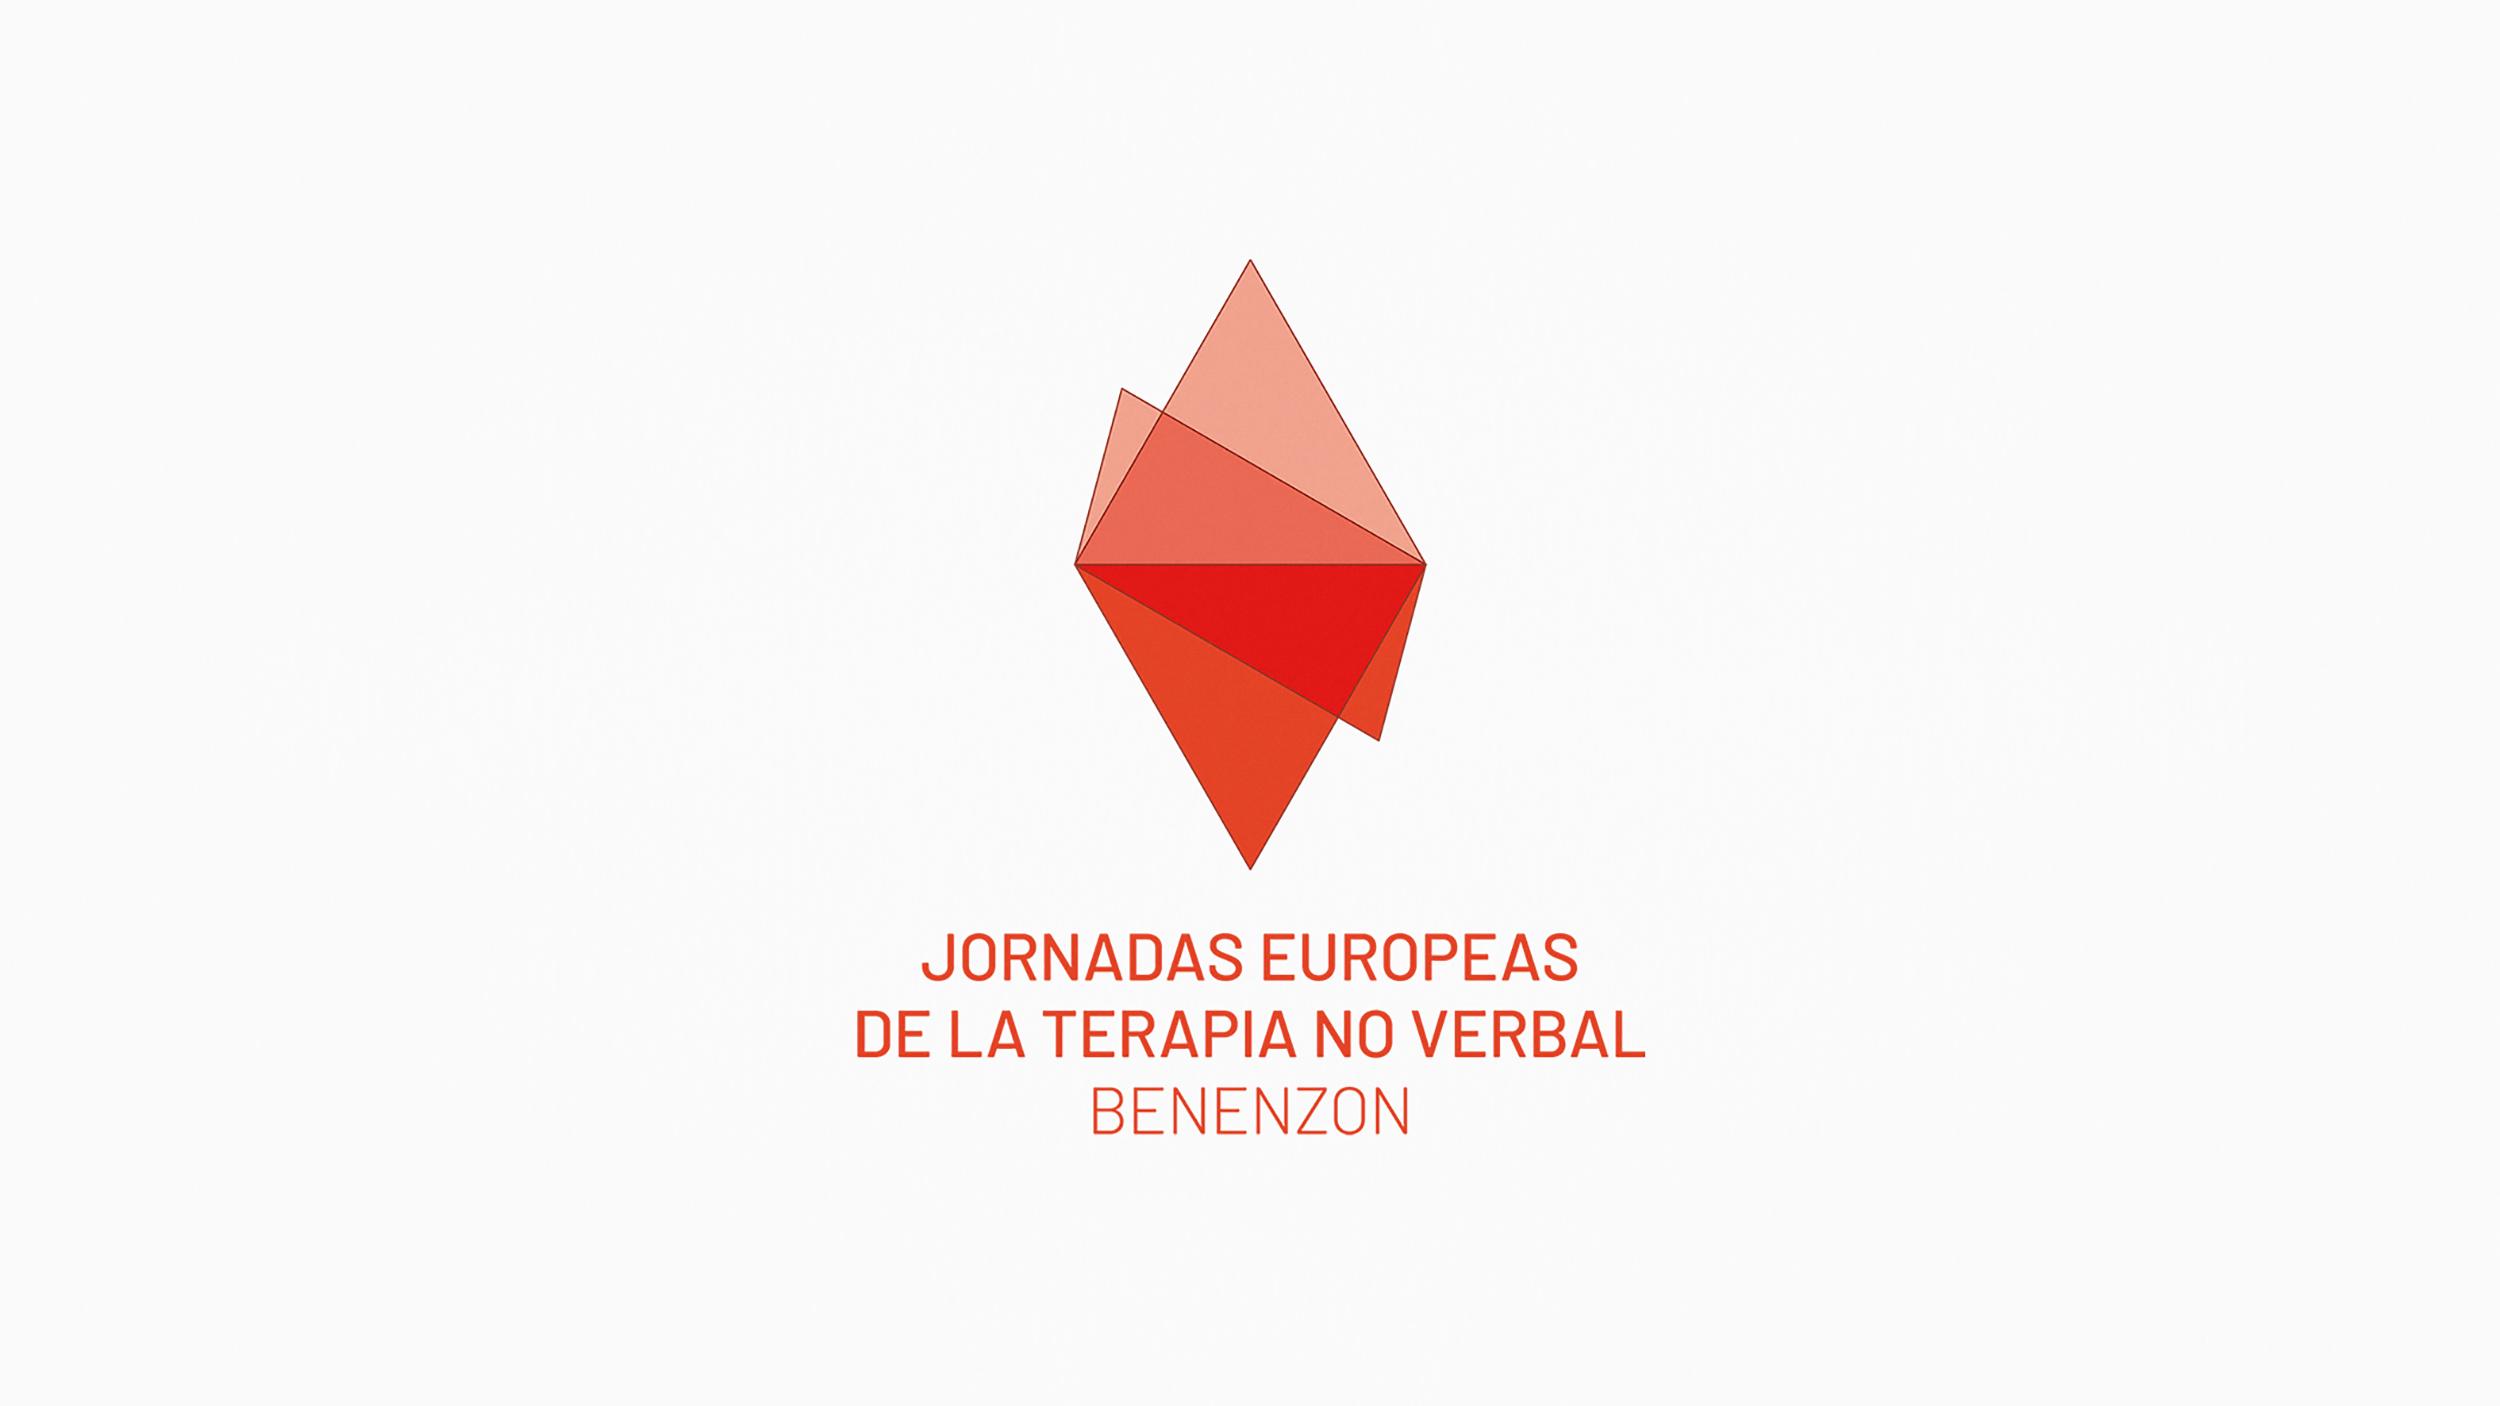 Jornadas Europeas Benenzon 06.jpg